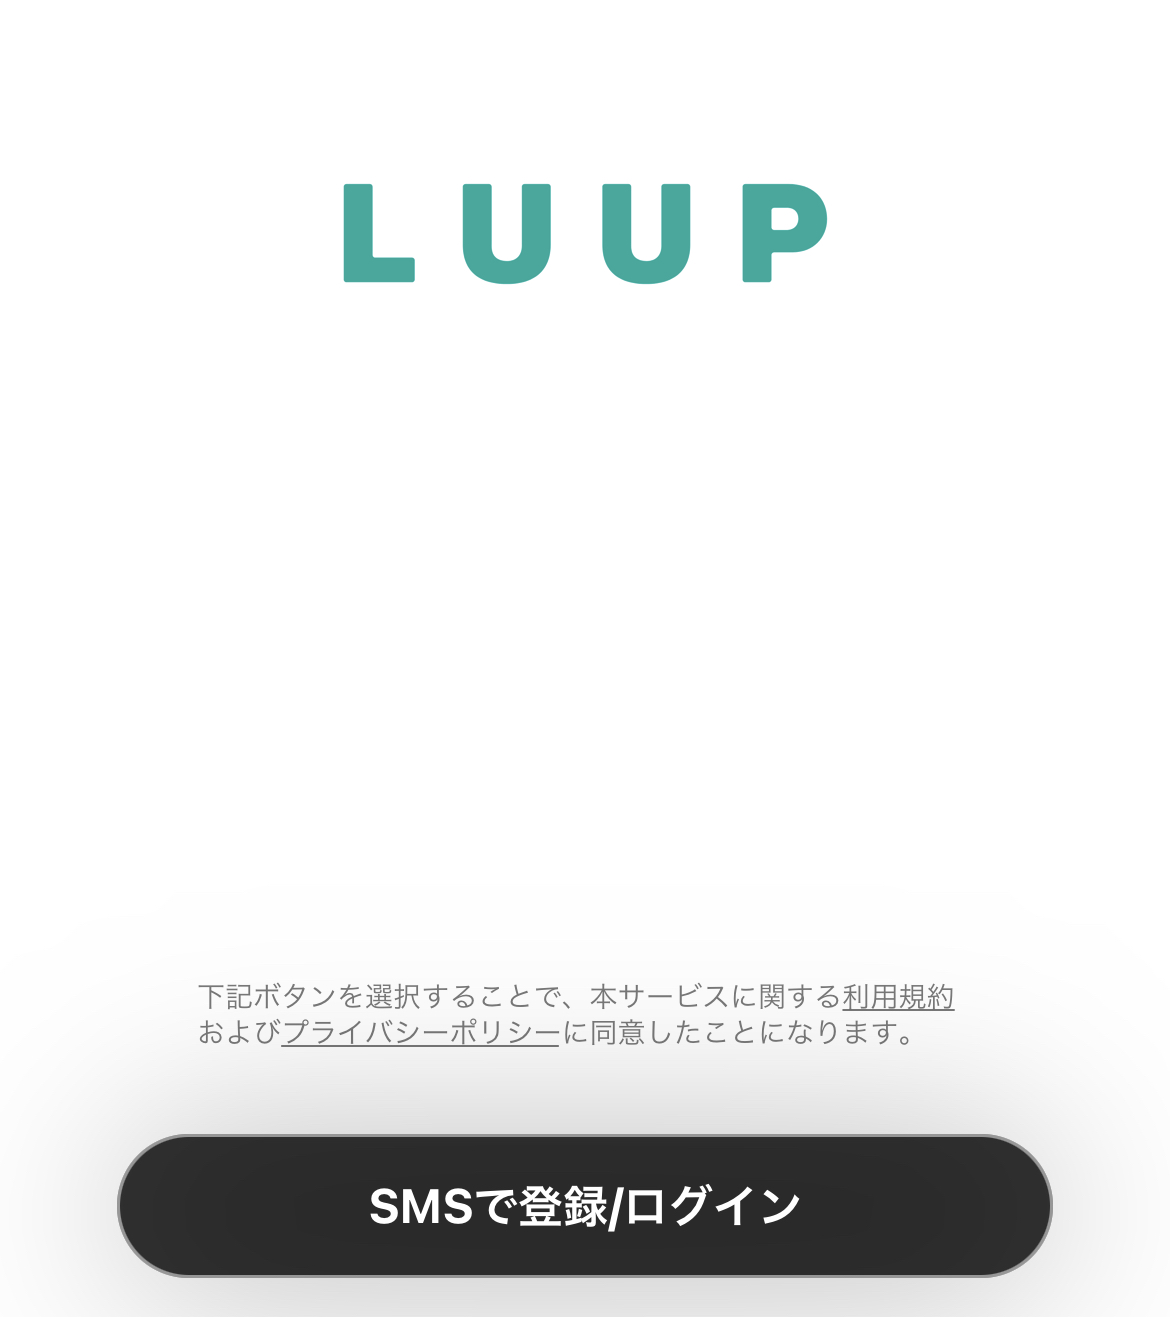 LUUP(ループ)の使い方 登録画面